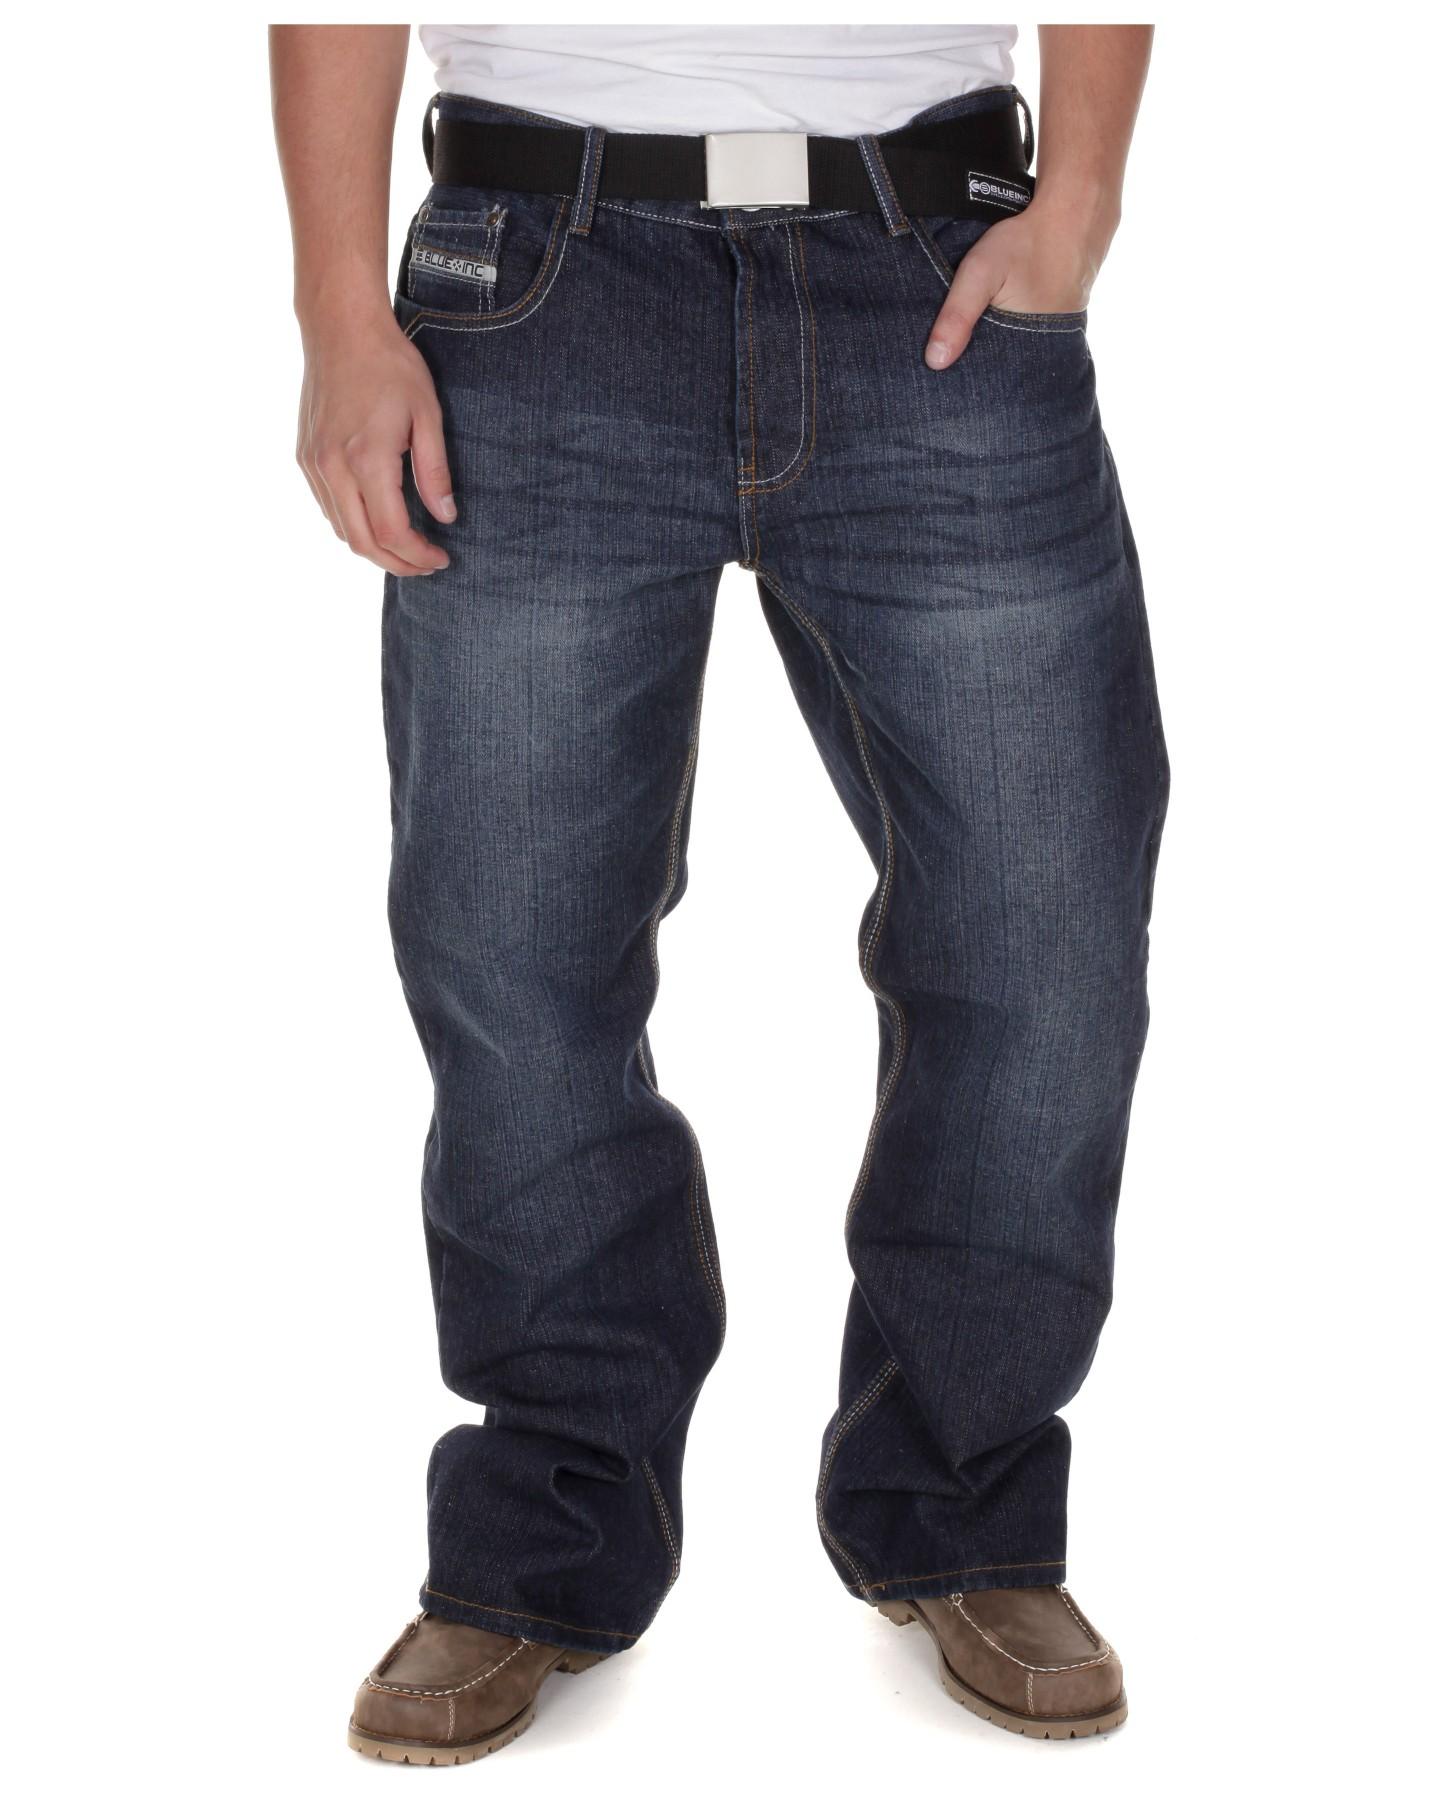 Blue-Inc-Mens-New-Sasha-Bootcut-Jeans-Rinse-Wash